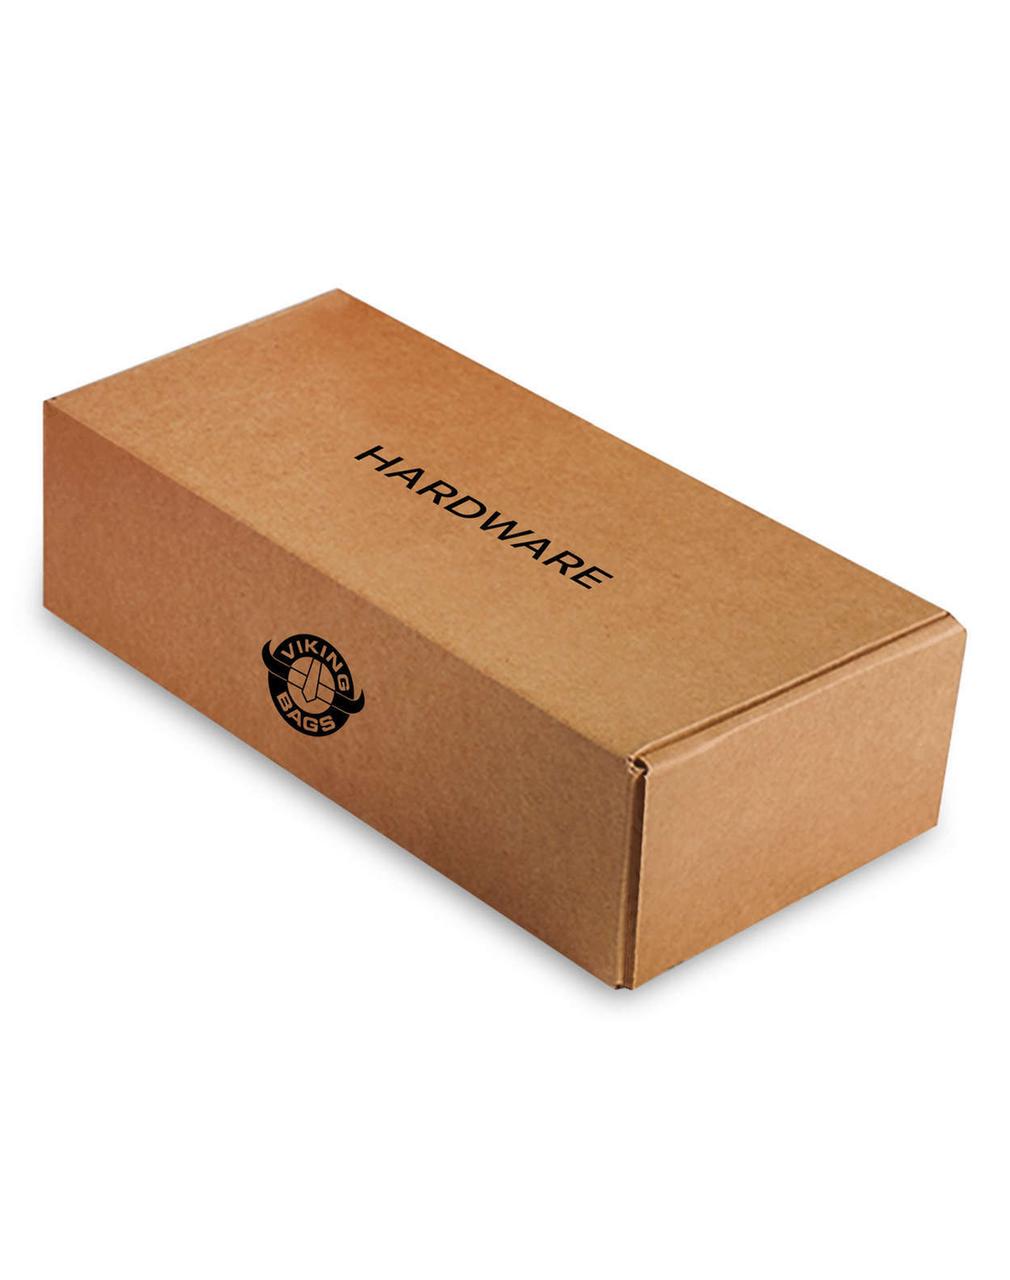 Honda 750 Shadow Phantom Warrior Series Large Motorcycle Saddlebags box